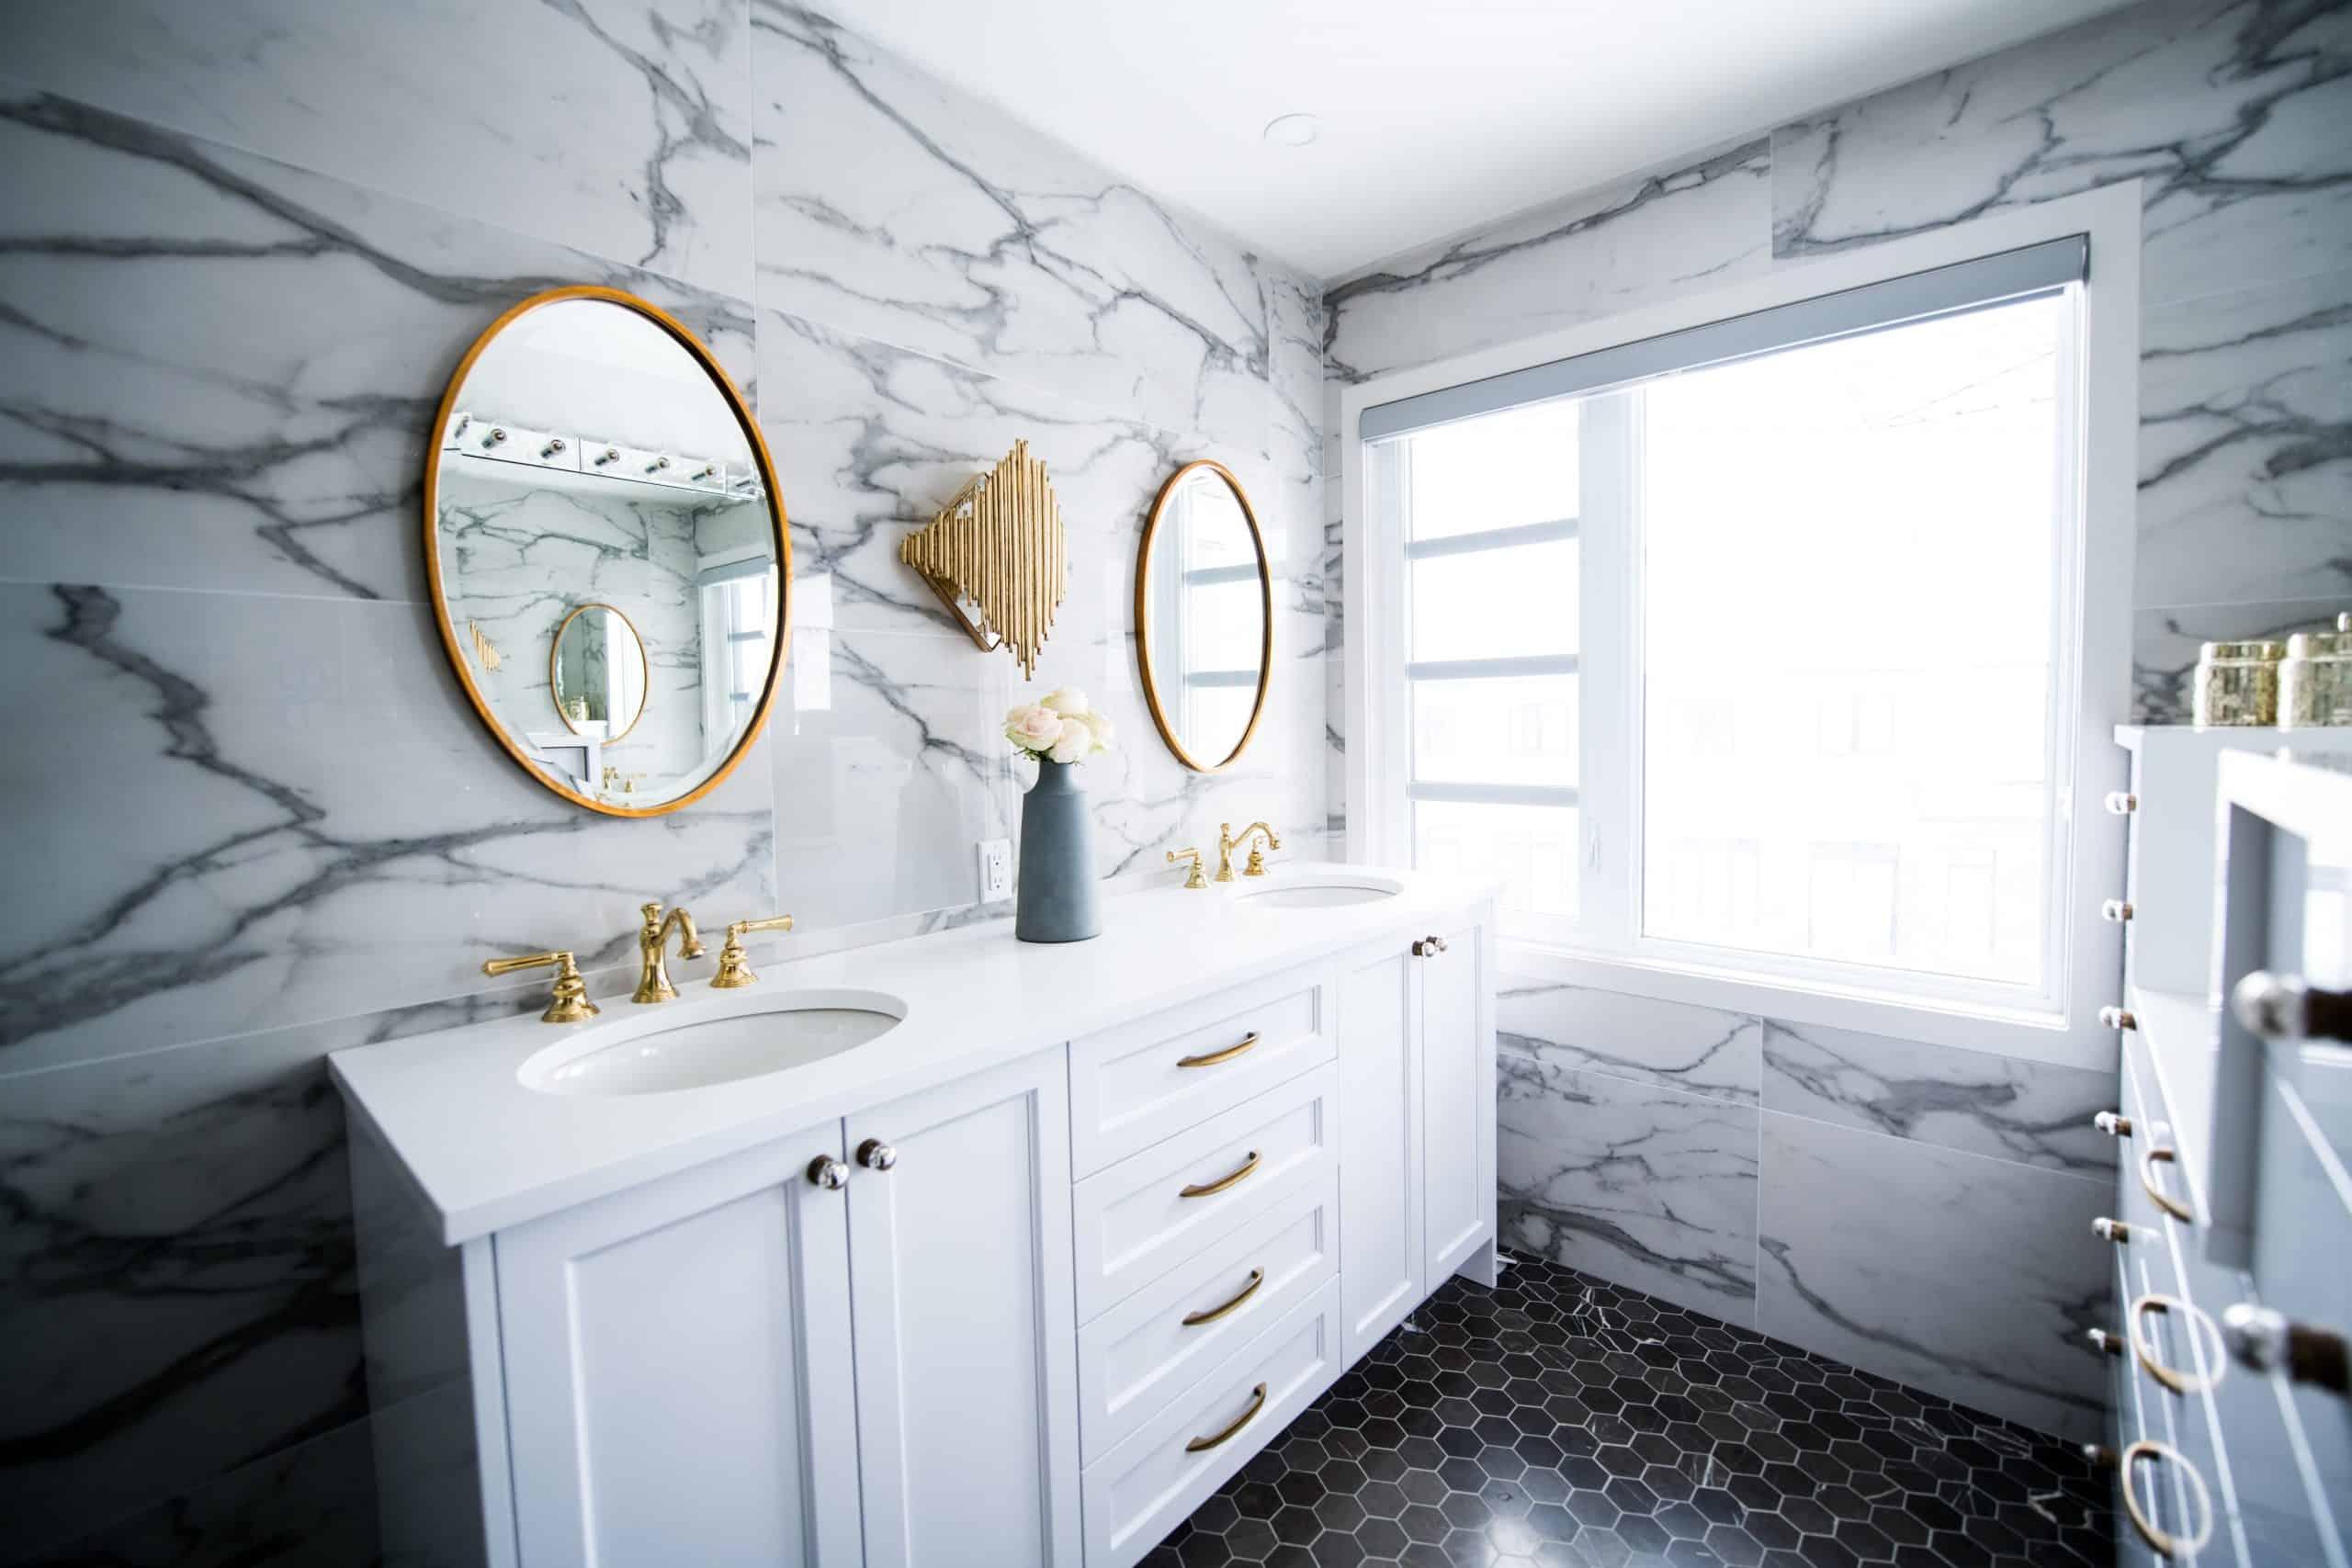 AquaSource Faucet & Toilet Reviews